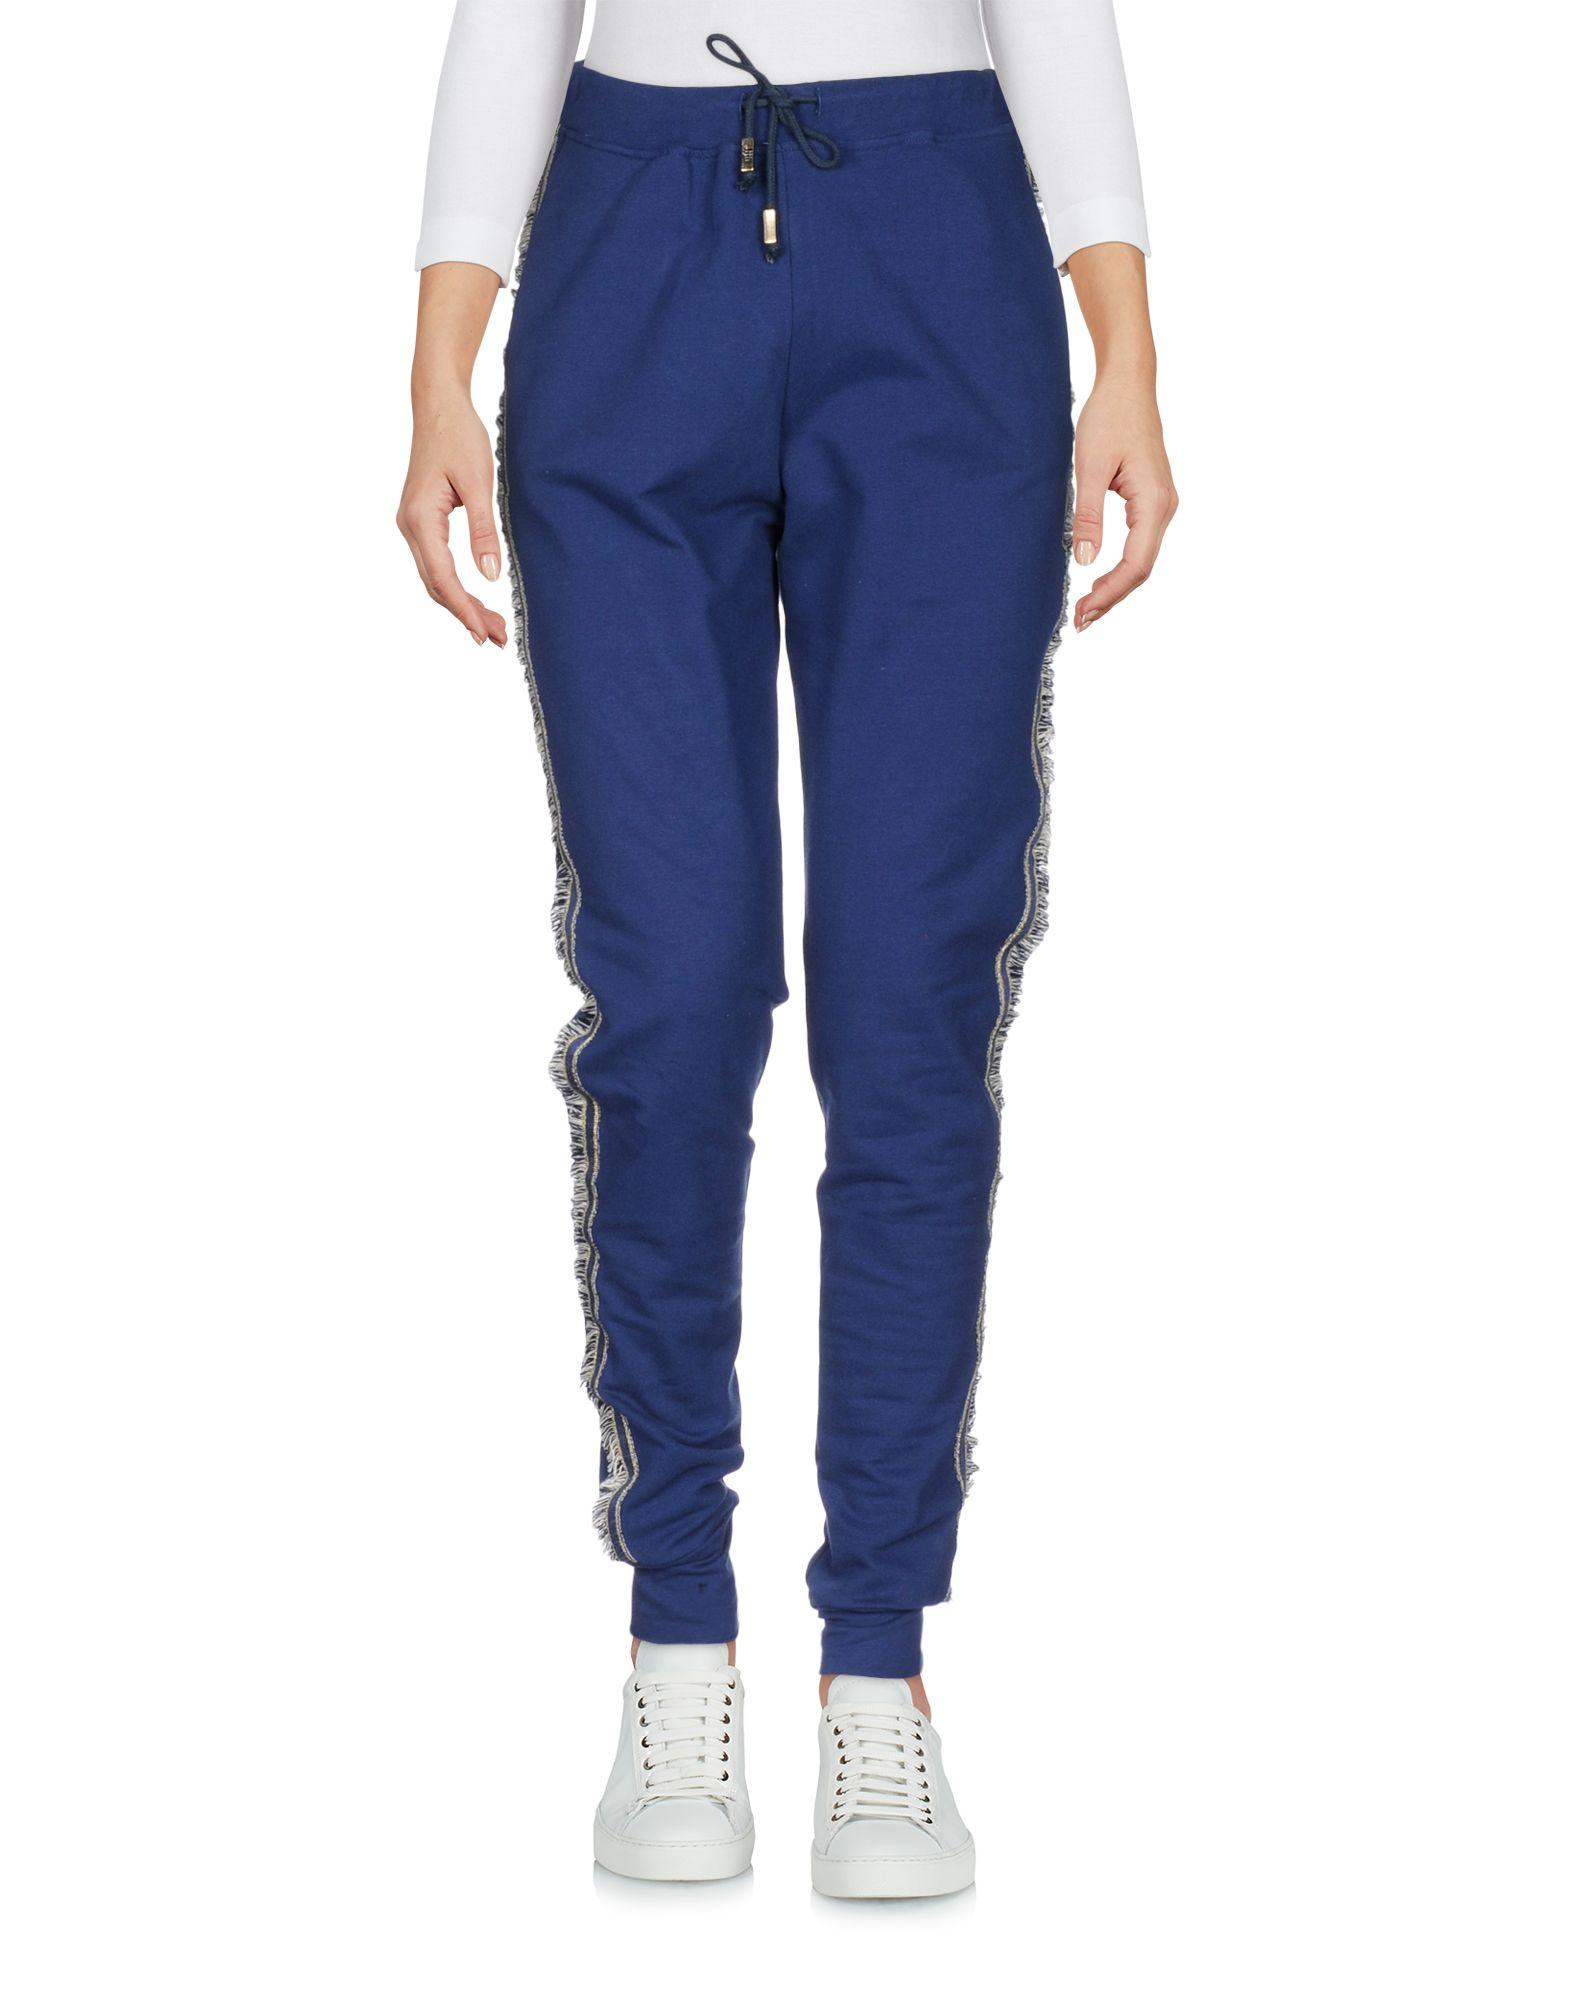 JIJIL Casual Pants in Blue